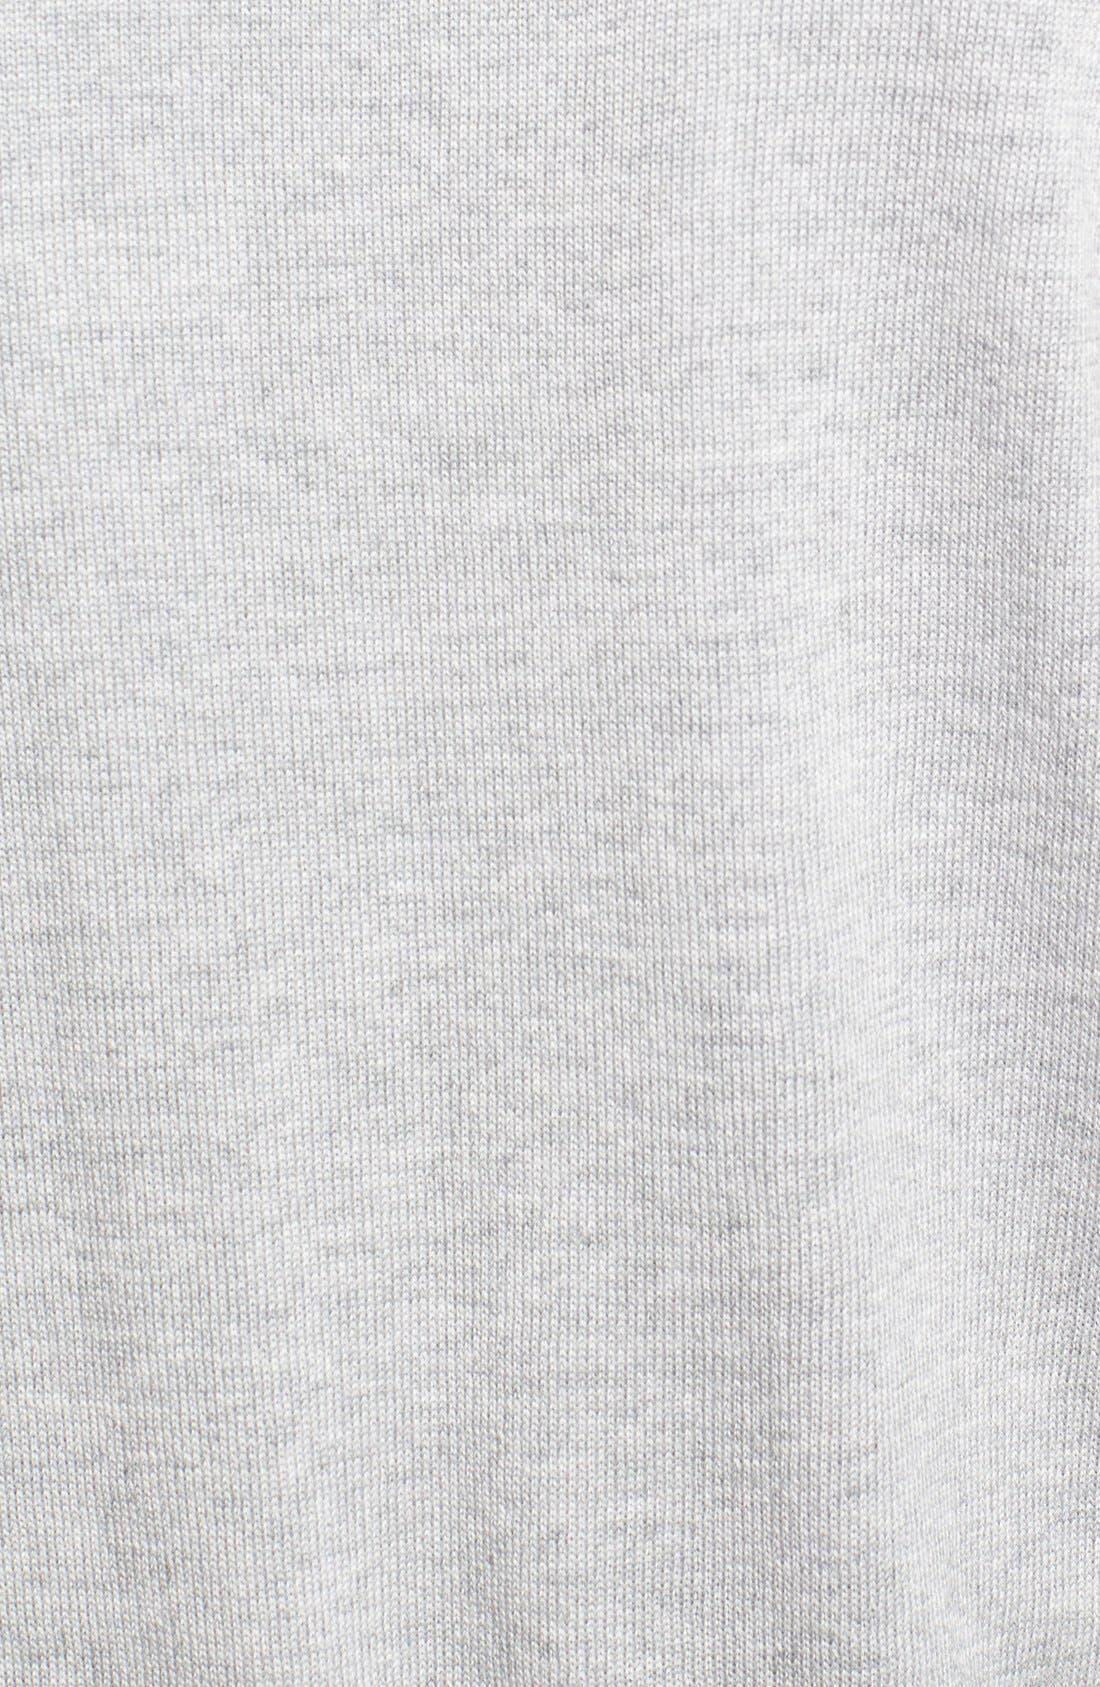 Italian Merino Wool Cardigan Sweater,                             Alternate thumbnail 3, color,                             050